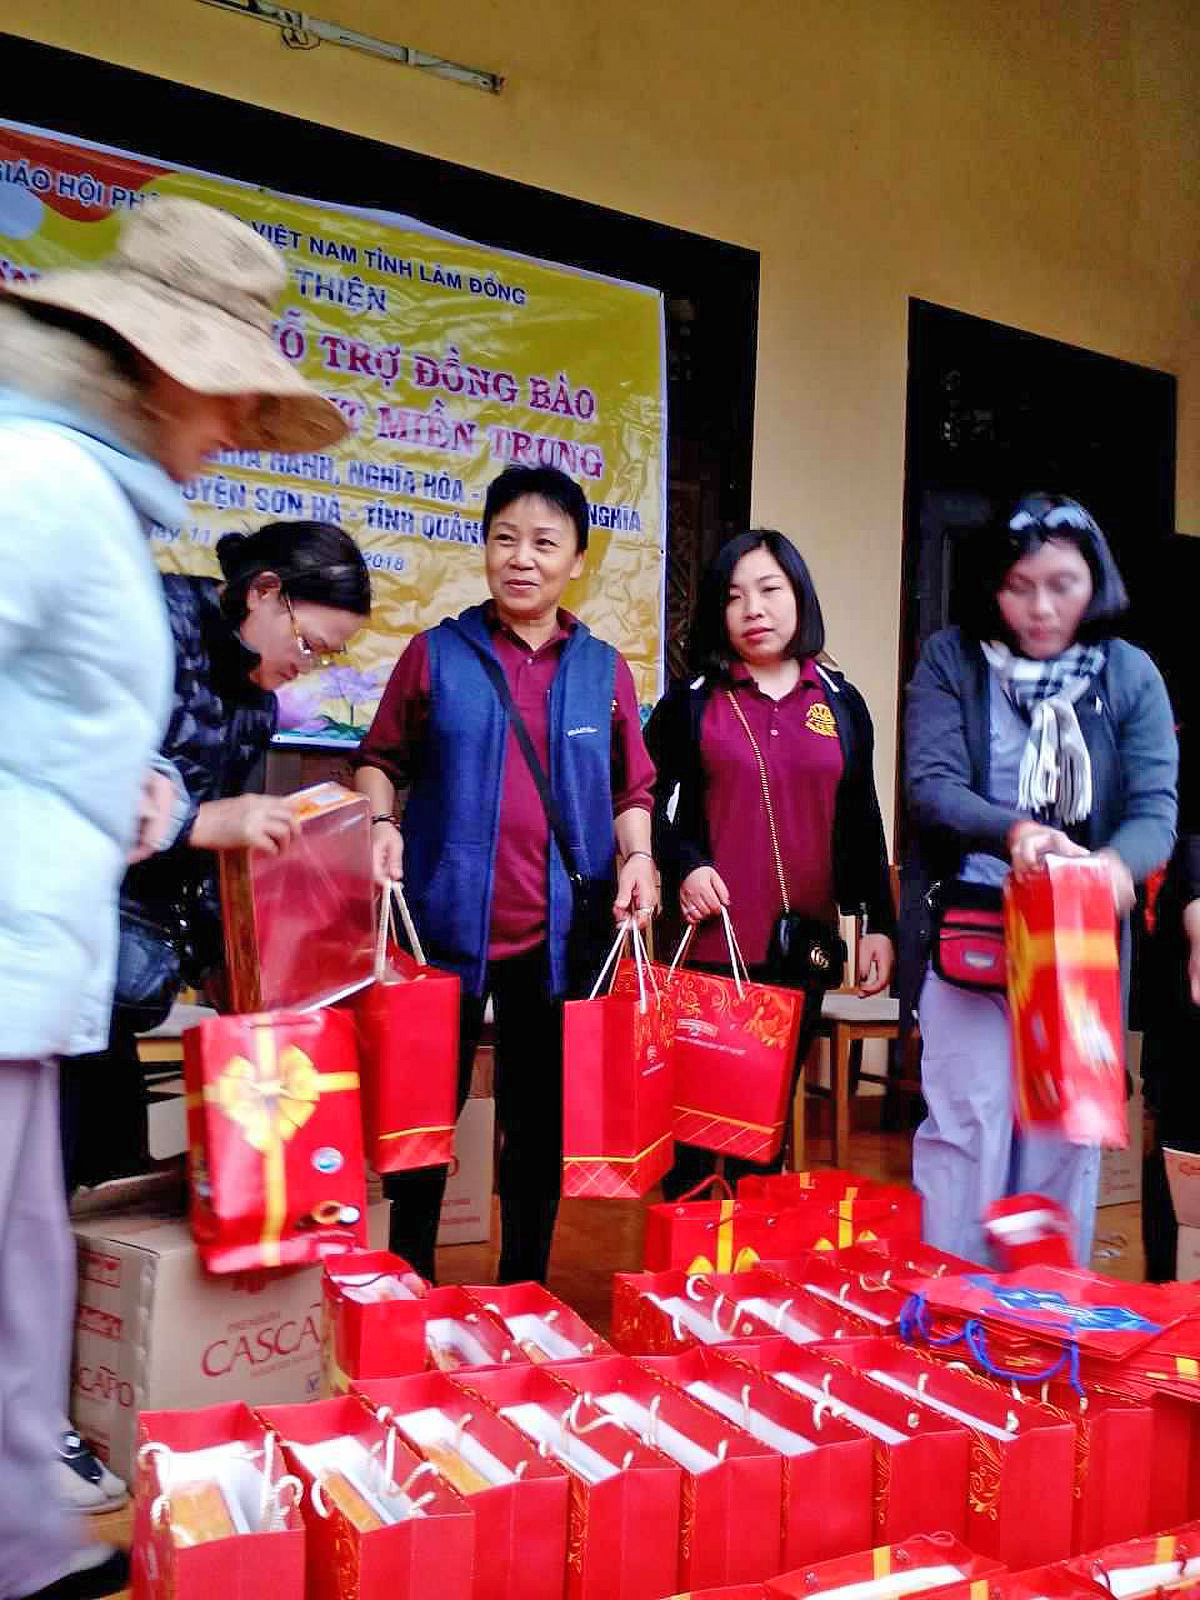 tang qua Quang ngai 2 (18)